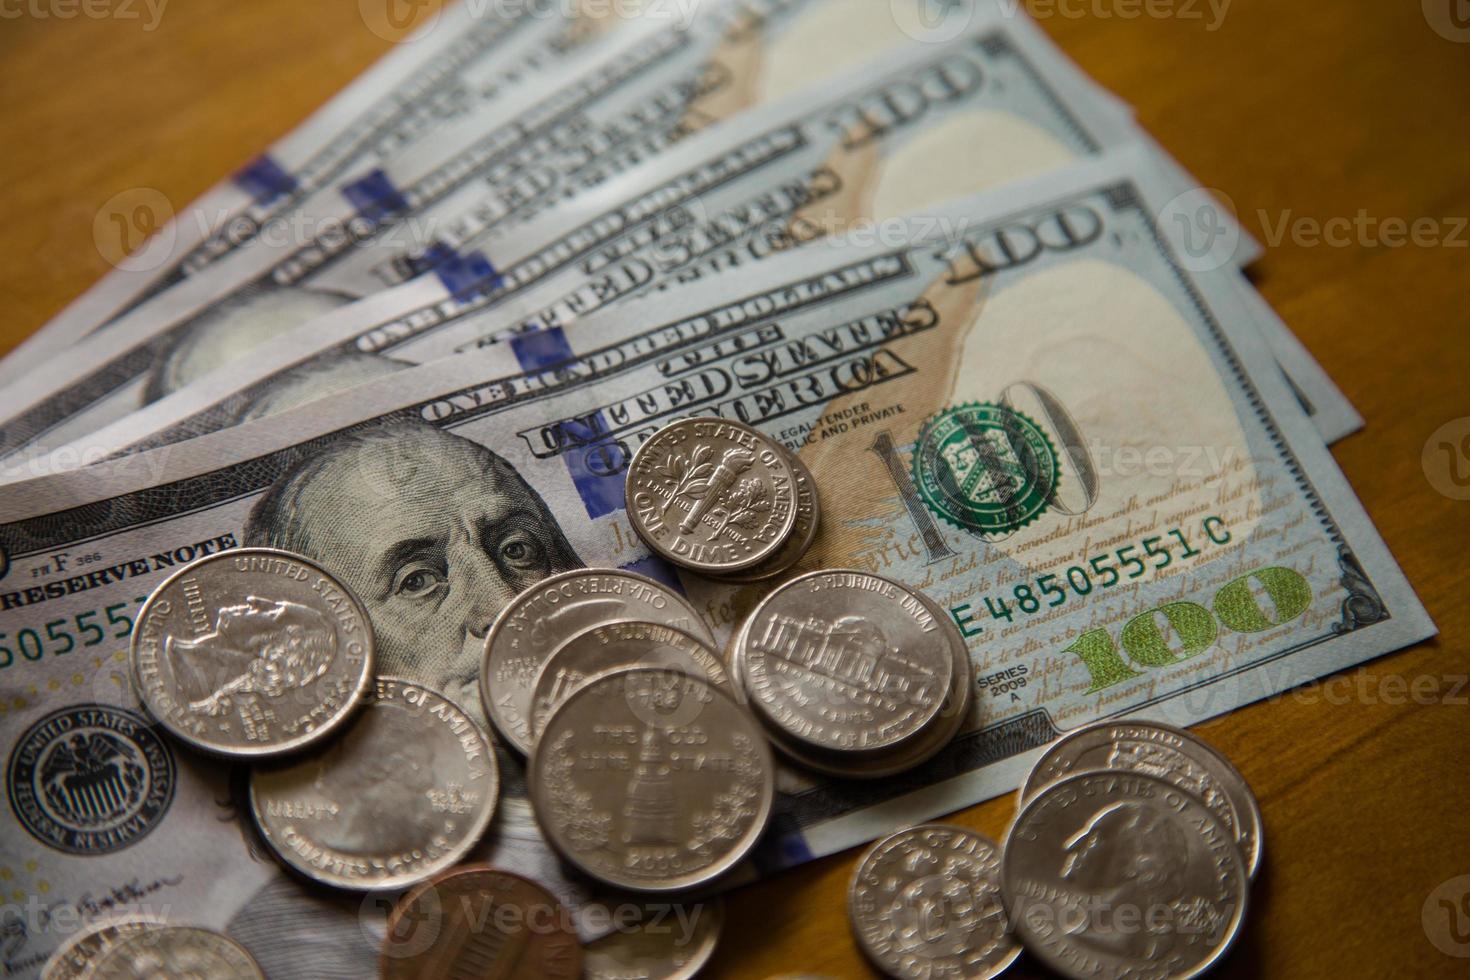 munten en bankbiljetten van dollars. foto